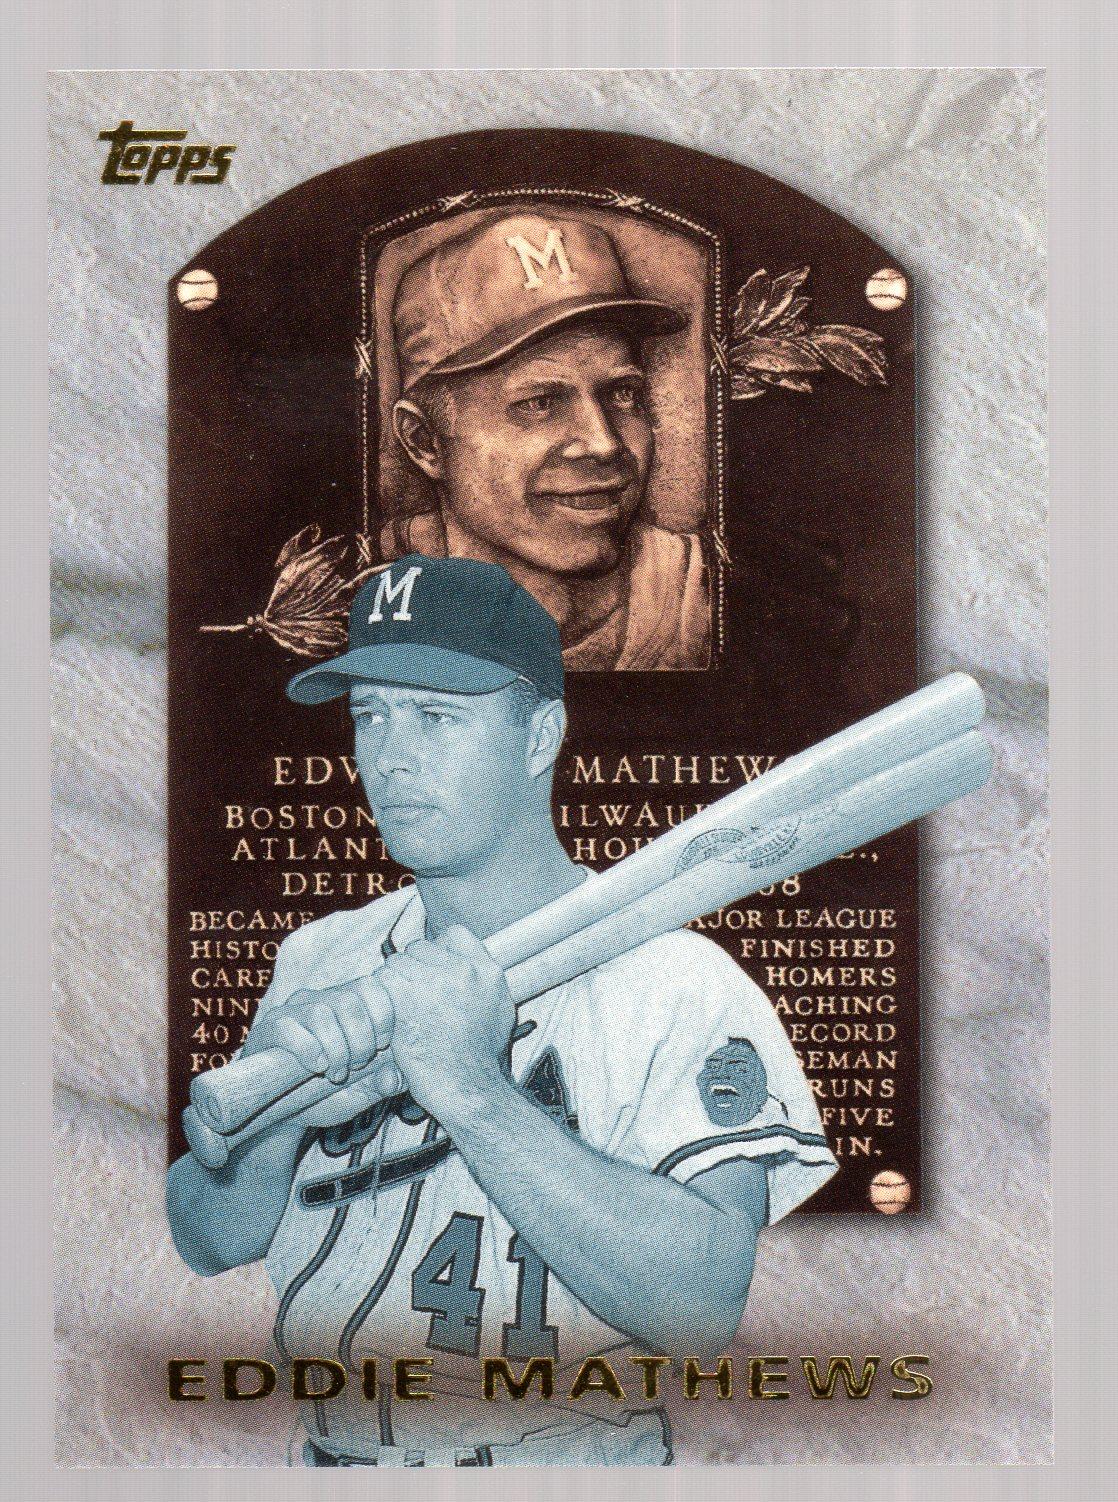 1999 Topps Hall of Fame Collection #HOF5 Eddie Mathews